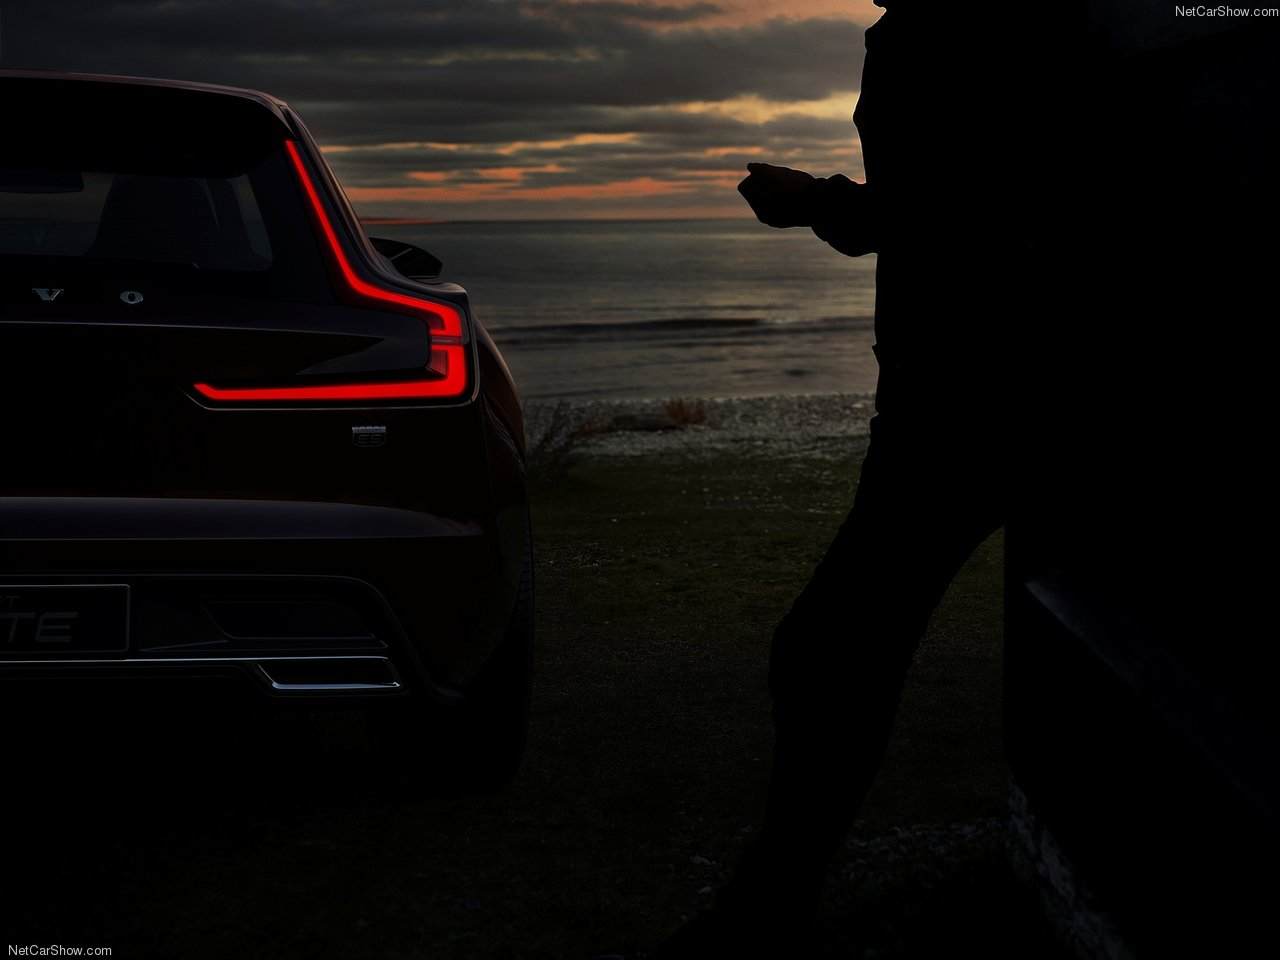 Volvo Estate Concept 2014 Volvo-Estate_Concept-2014-1280-2a